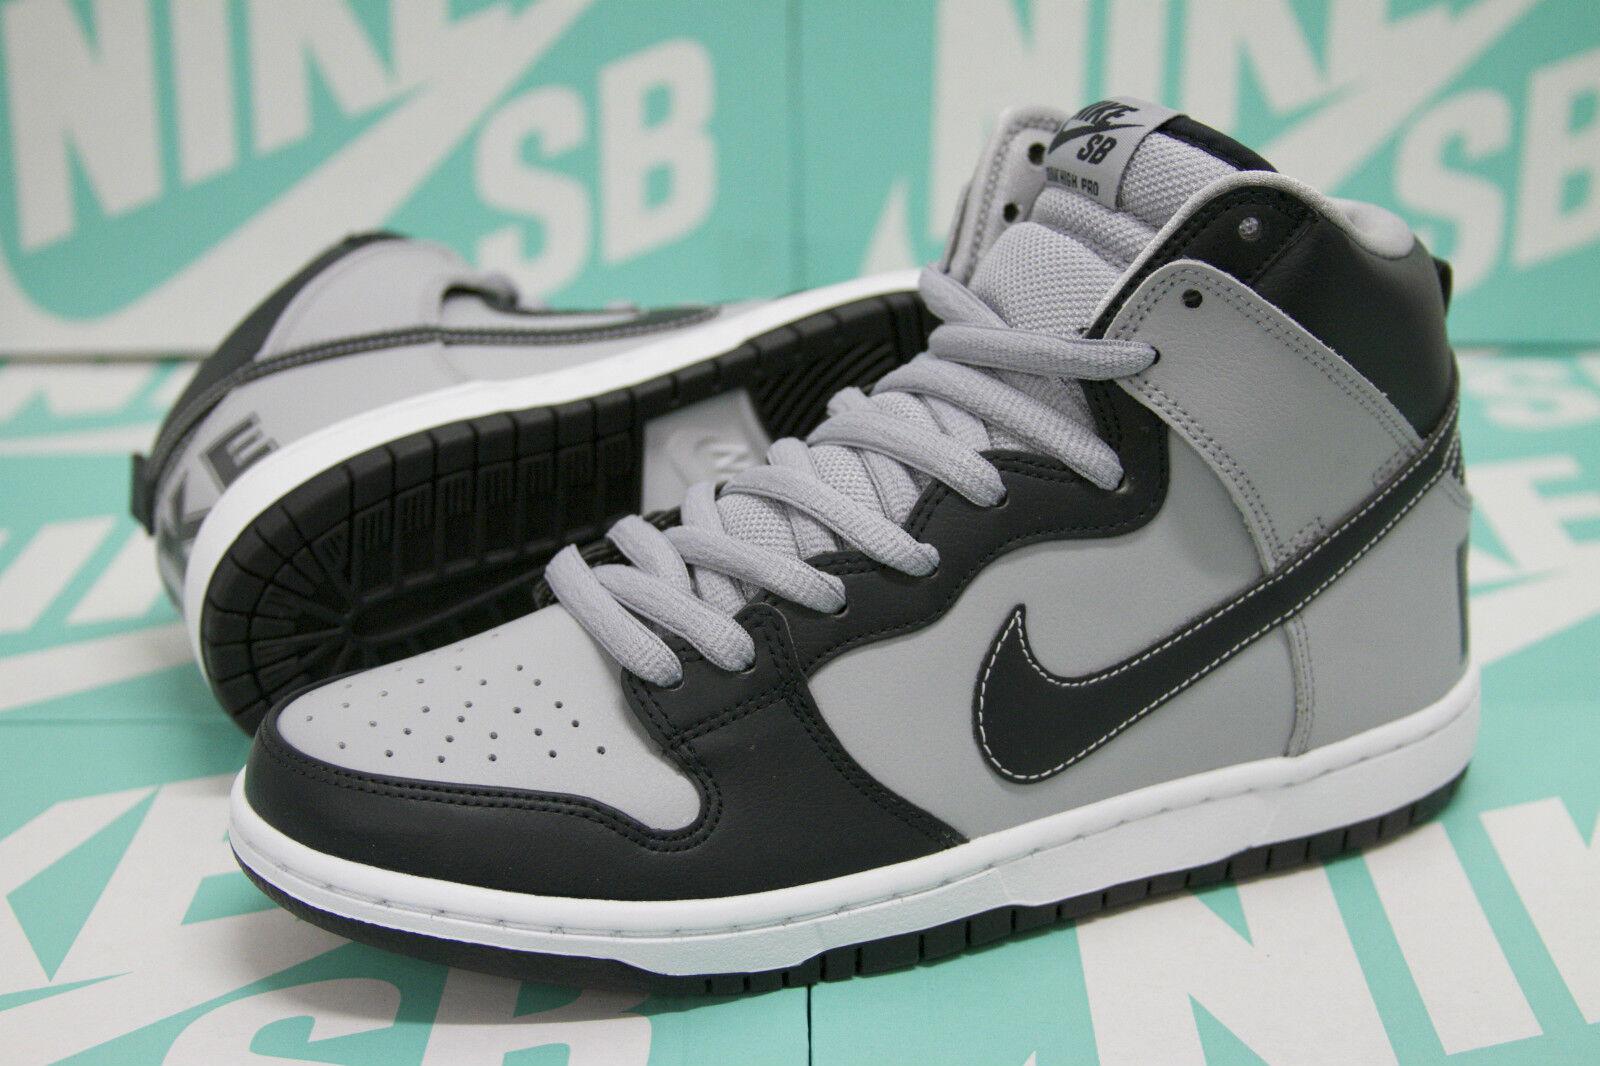 Nike sb schiacciare alto premio - rivale pack georgetown hoyas 313171 440 ossidiana grigia